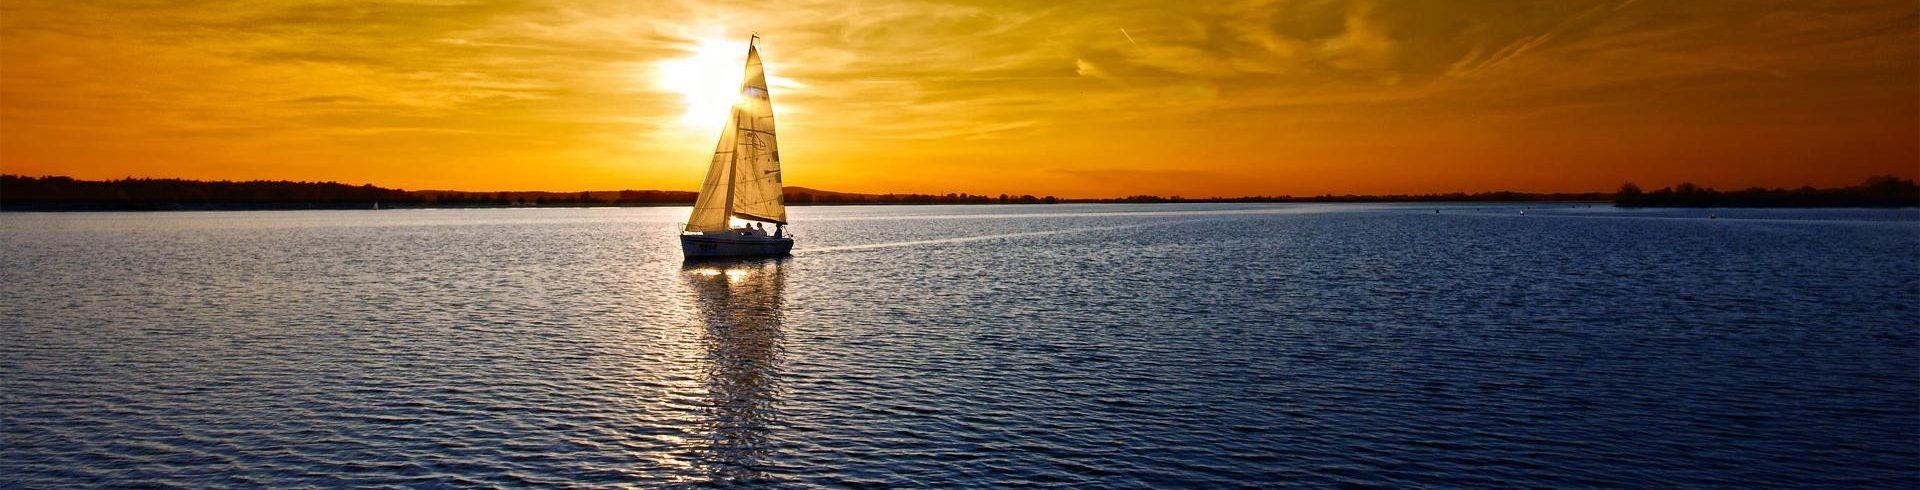 Exeter Sailing